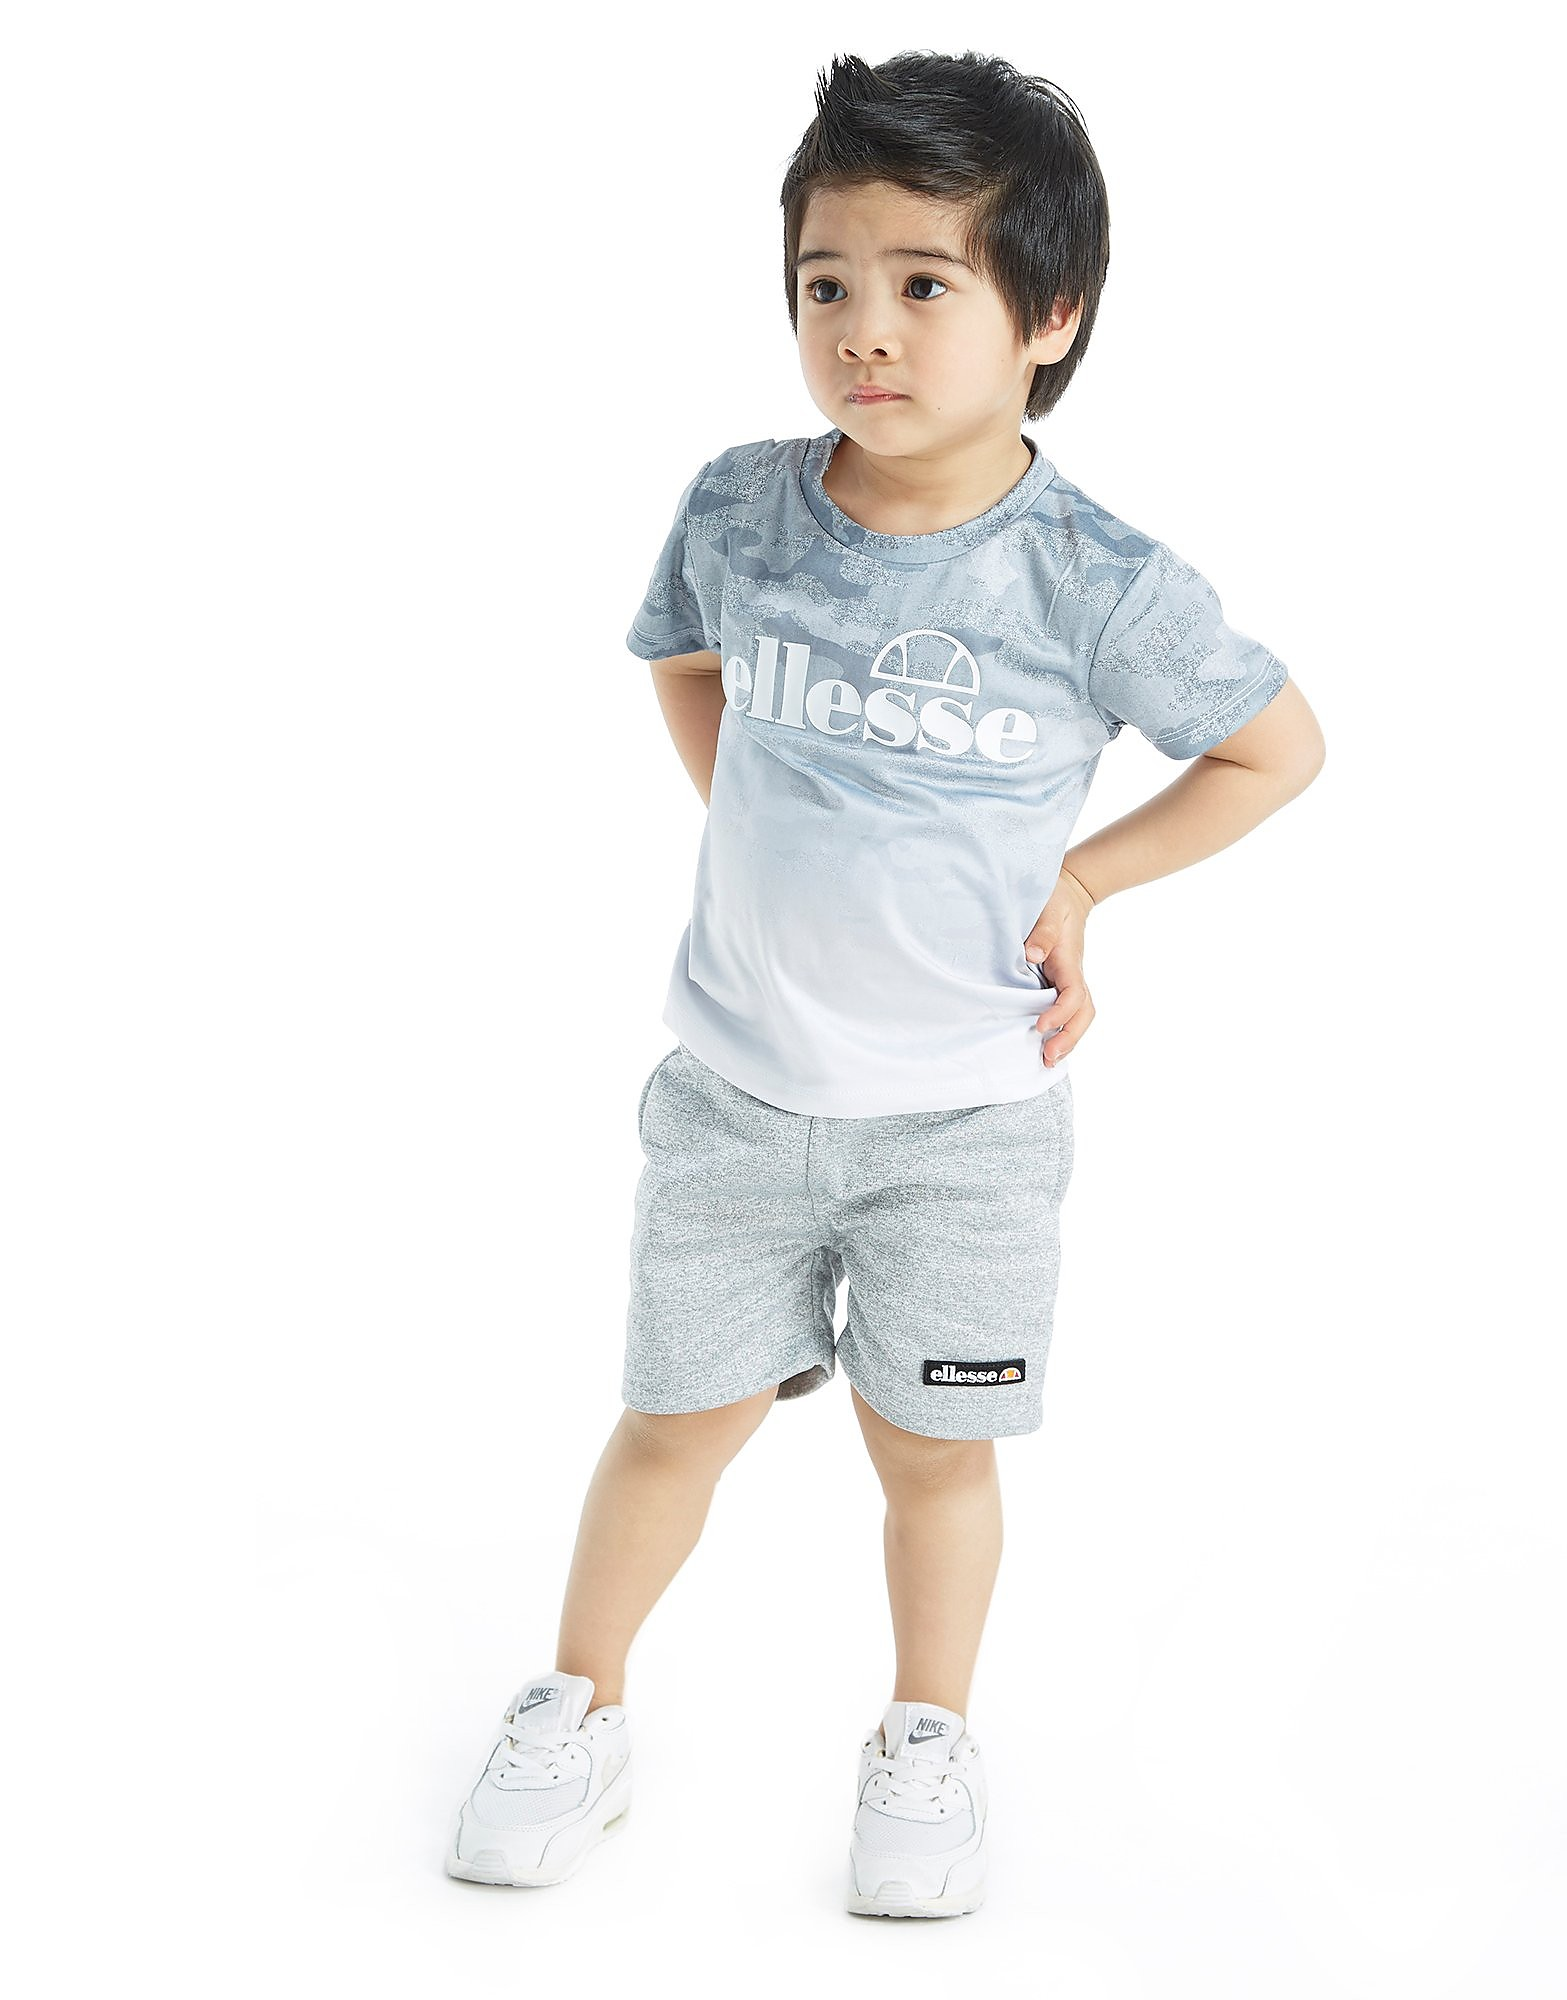 Ellesse Diego Fade T-Shirt & Shorts Set Infant